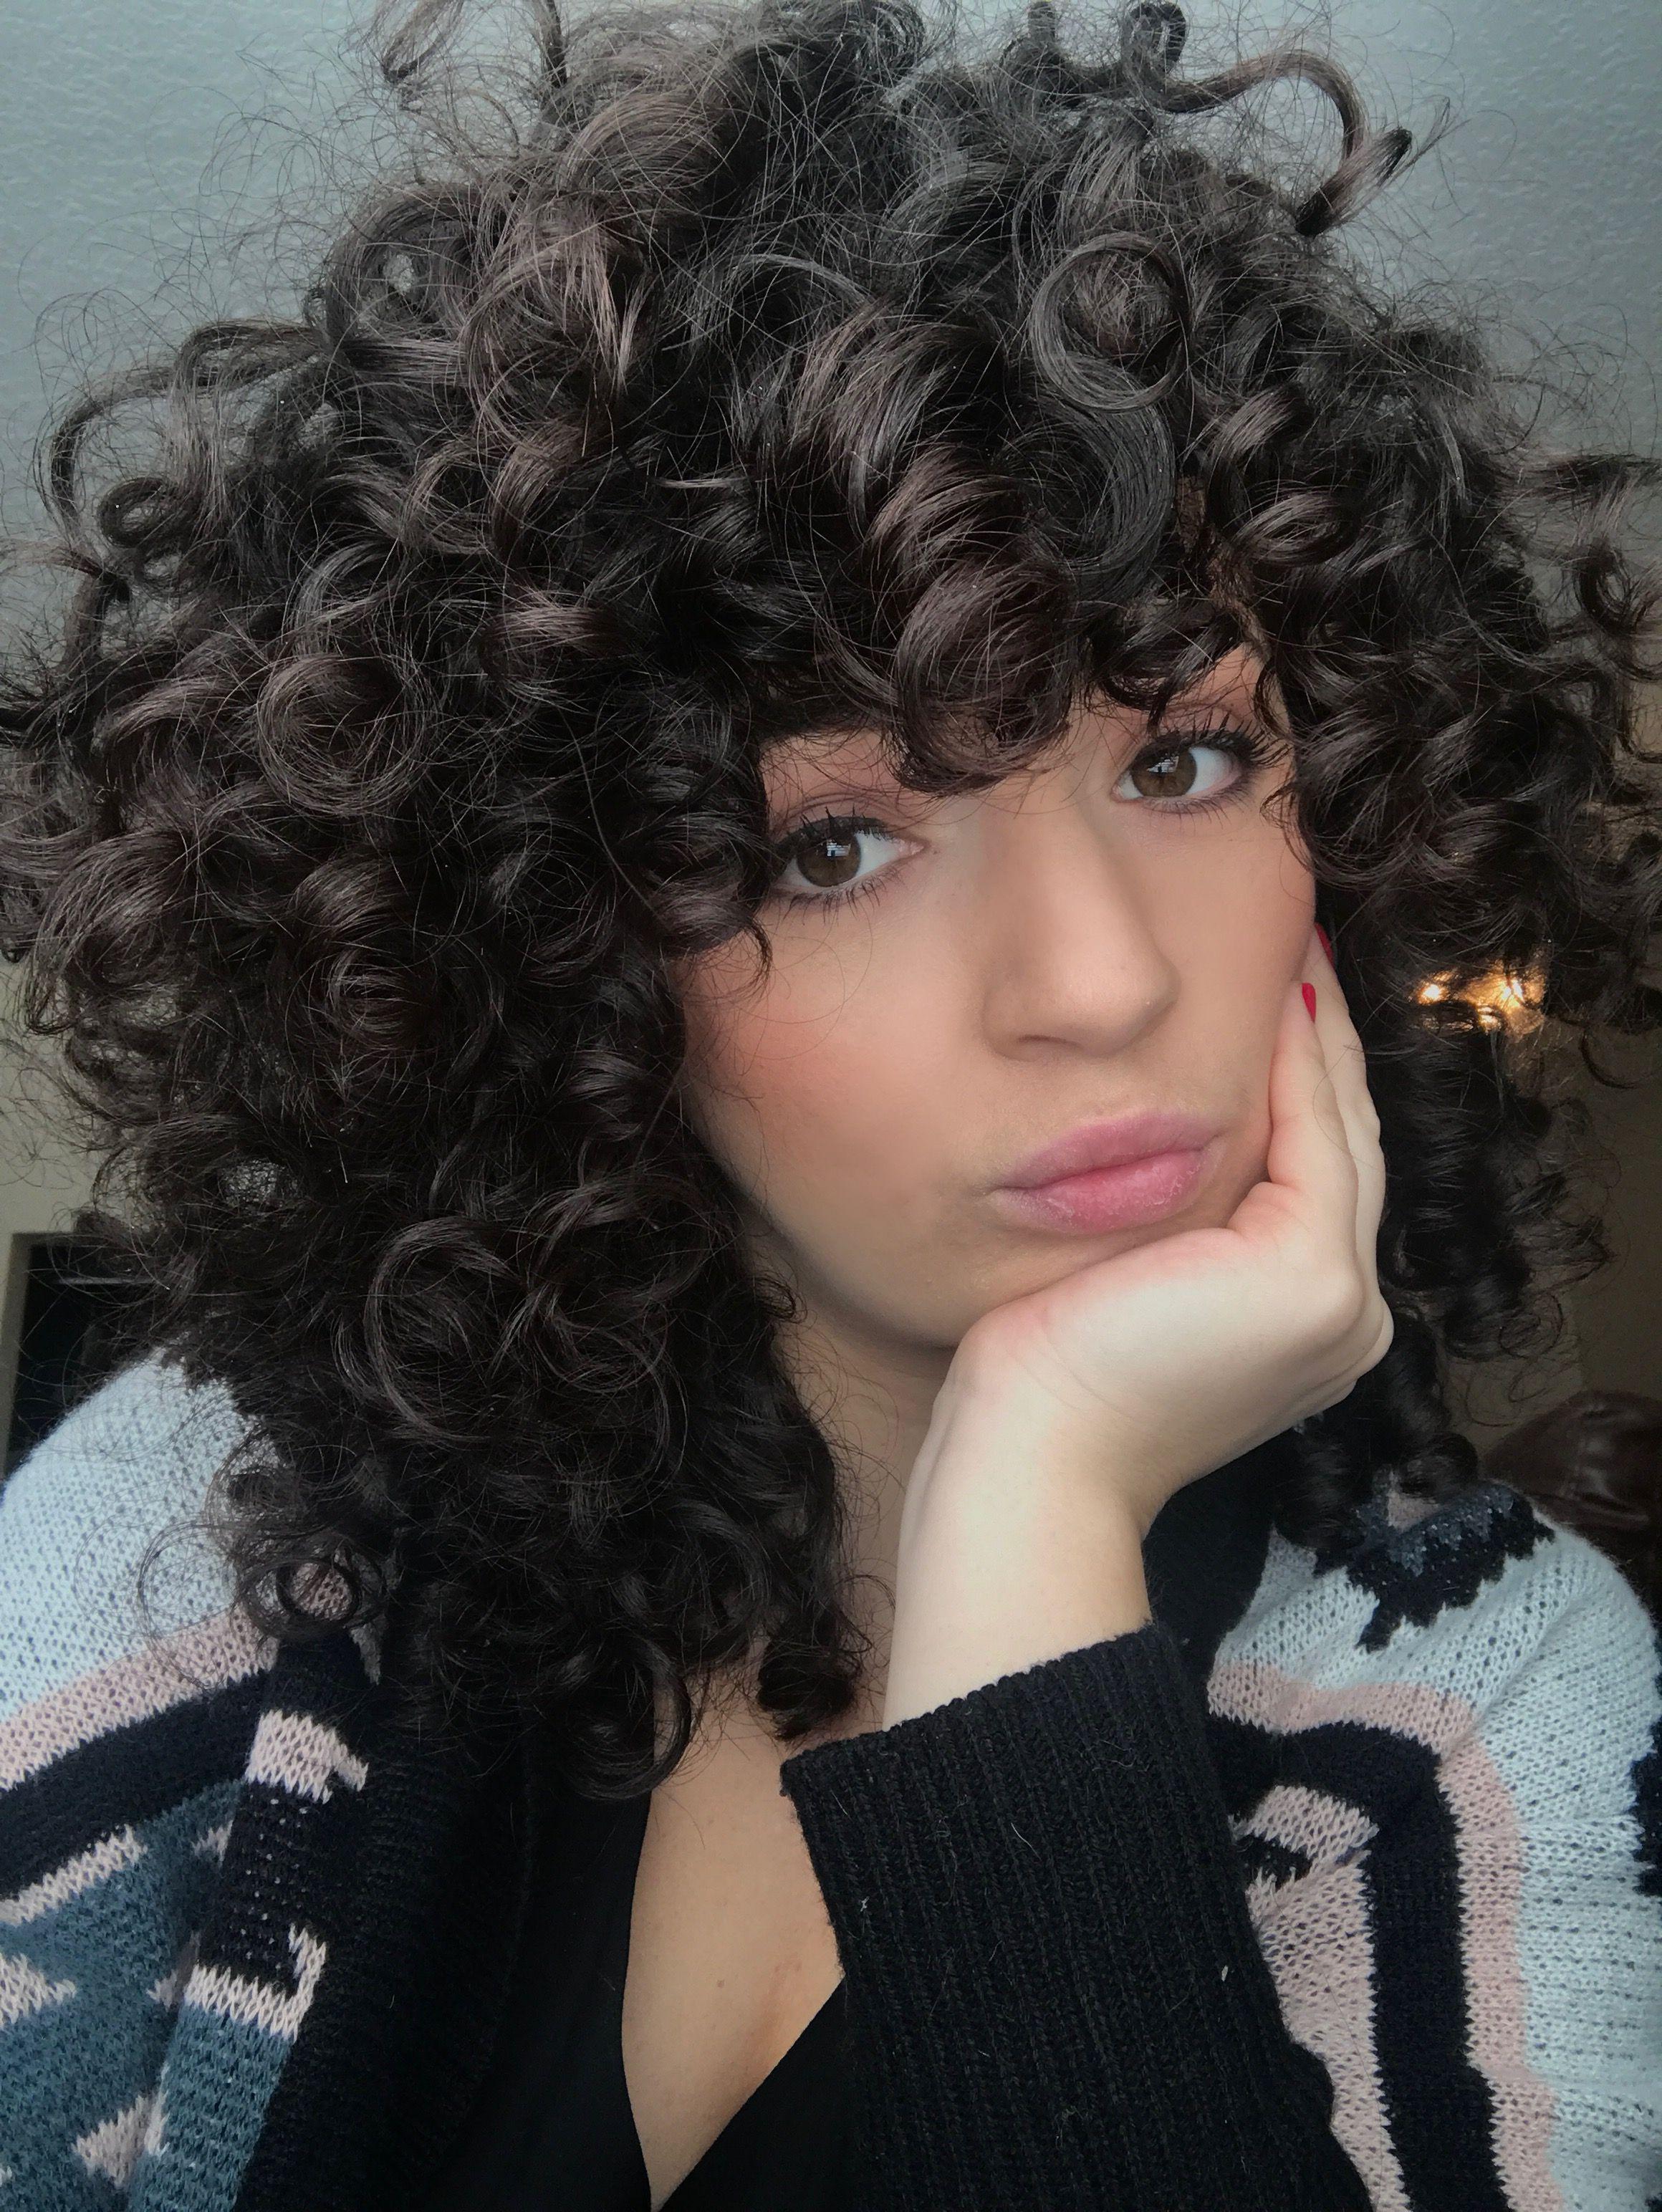 3b curls Shaggy cut Curly hair iG littlemisssaly